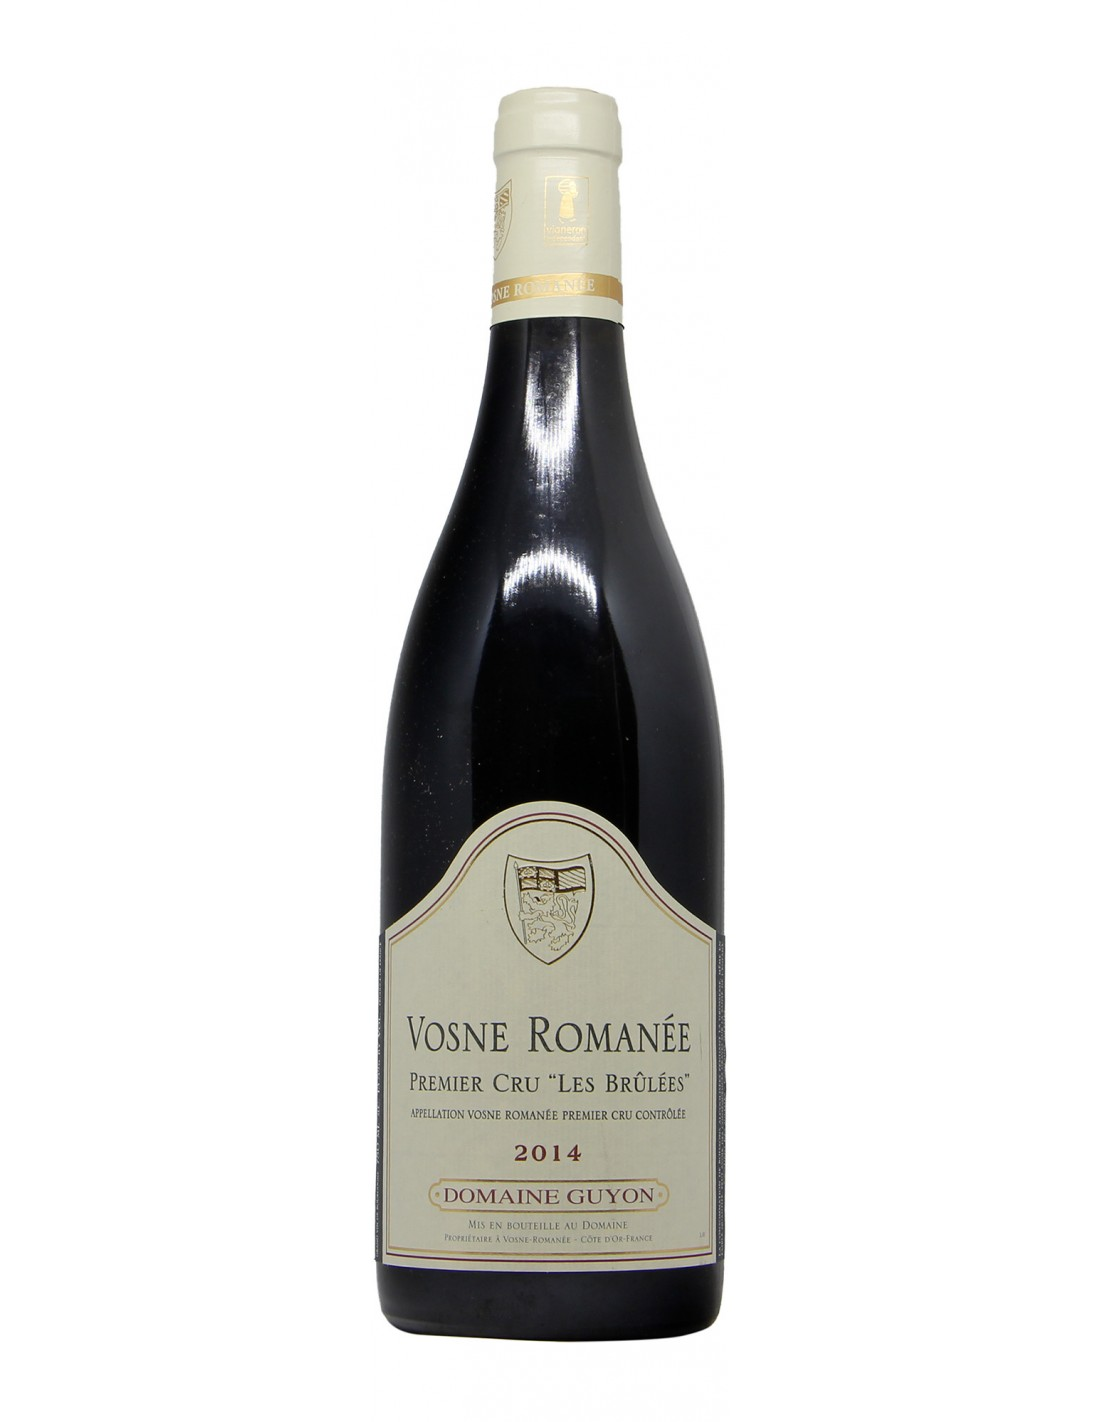 VOSNE ROMANEE 1ER CRU LES BRULEES 2014 GUYON Grandi Bottiglie